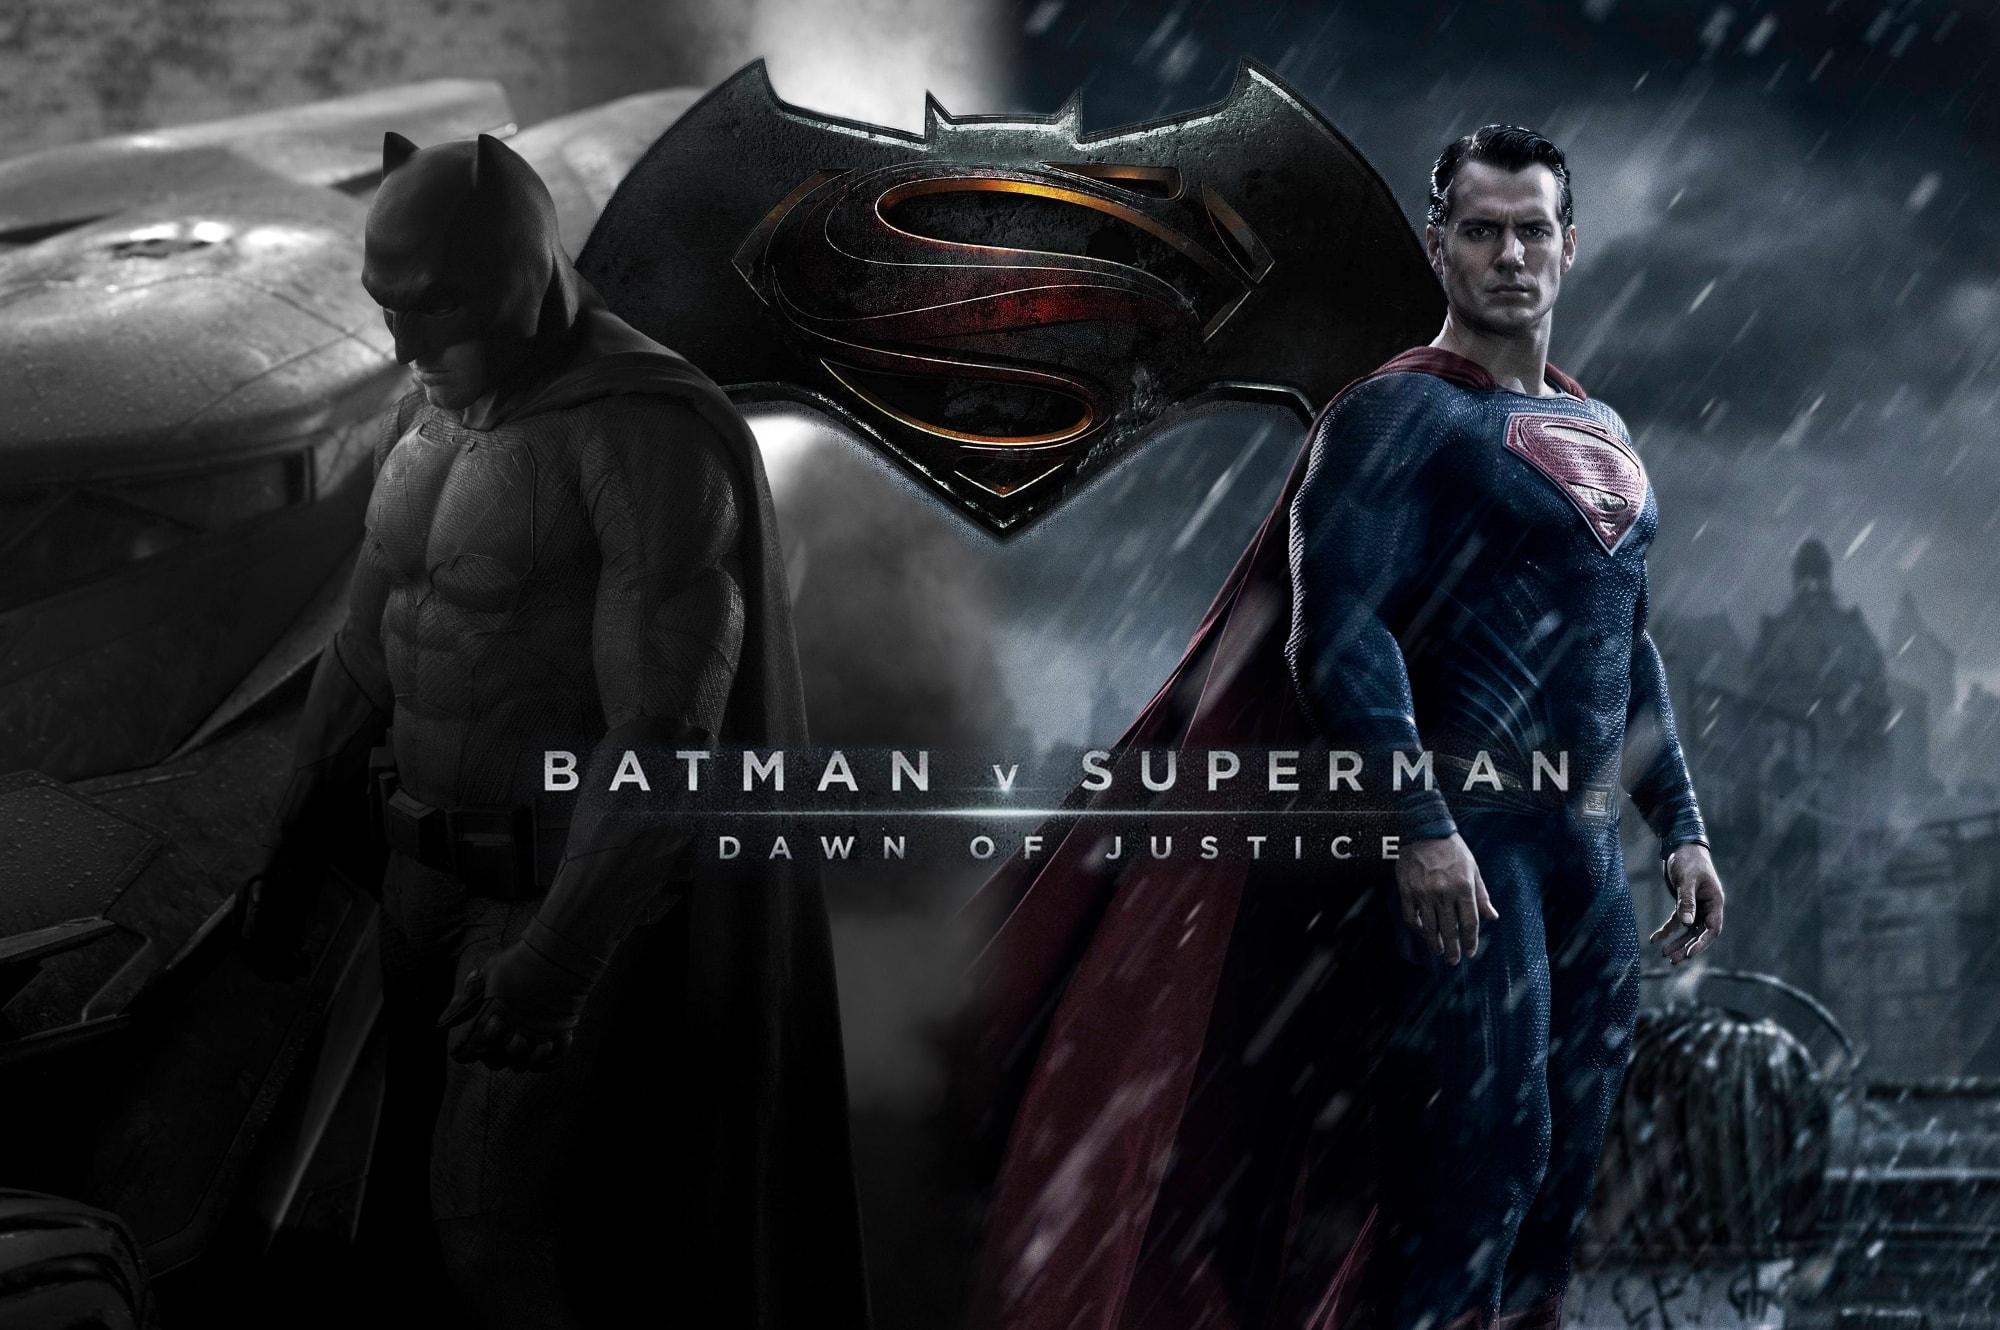 Batman Vs Superman Dawn Of Justice Hd Wallpapers 7wallpapers Net